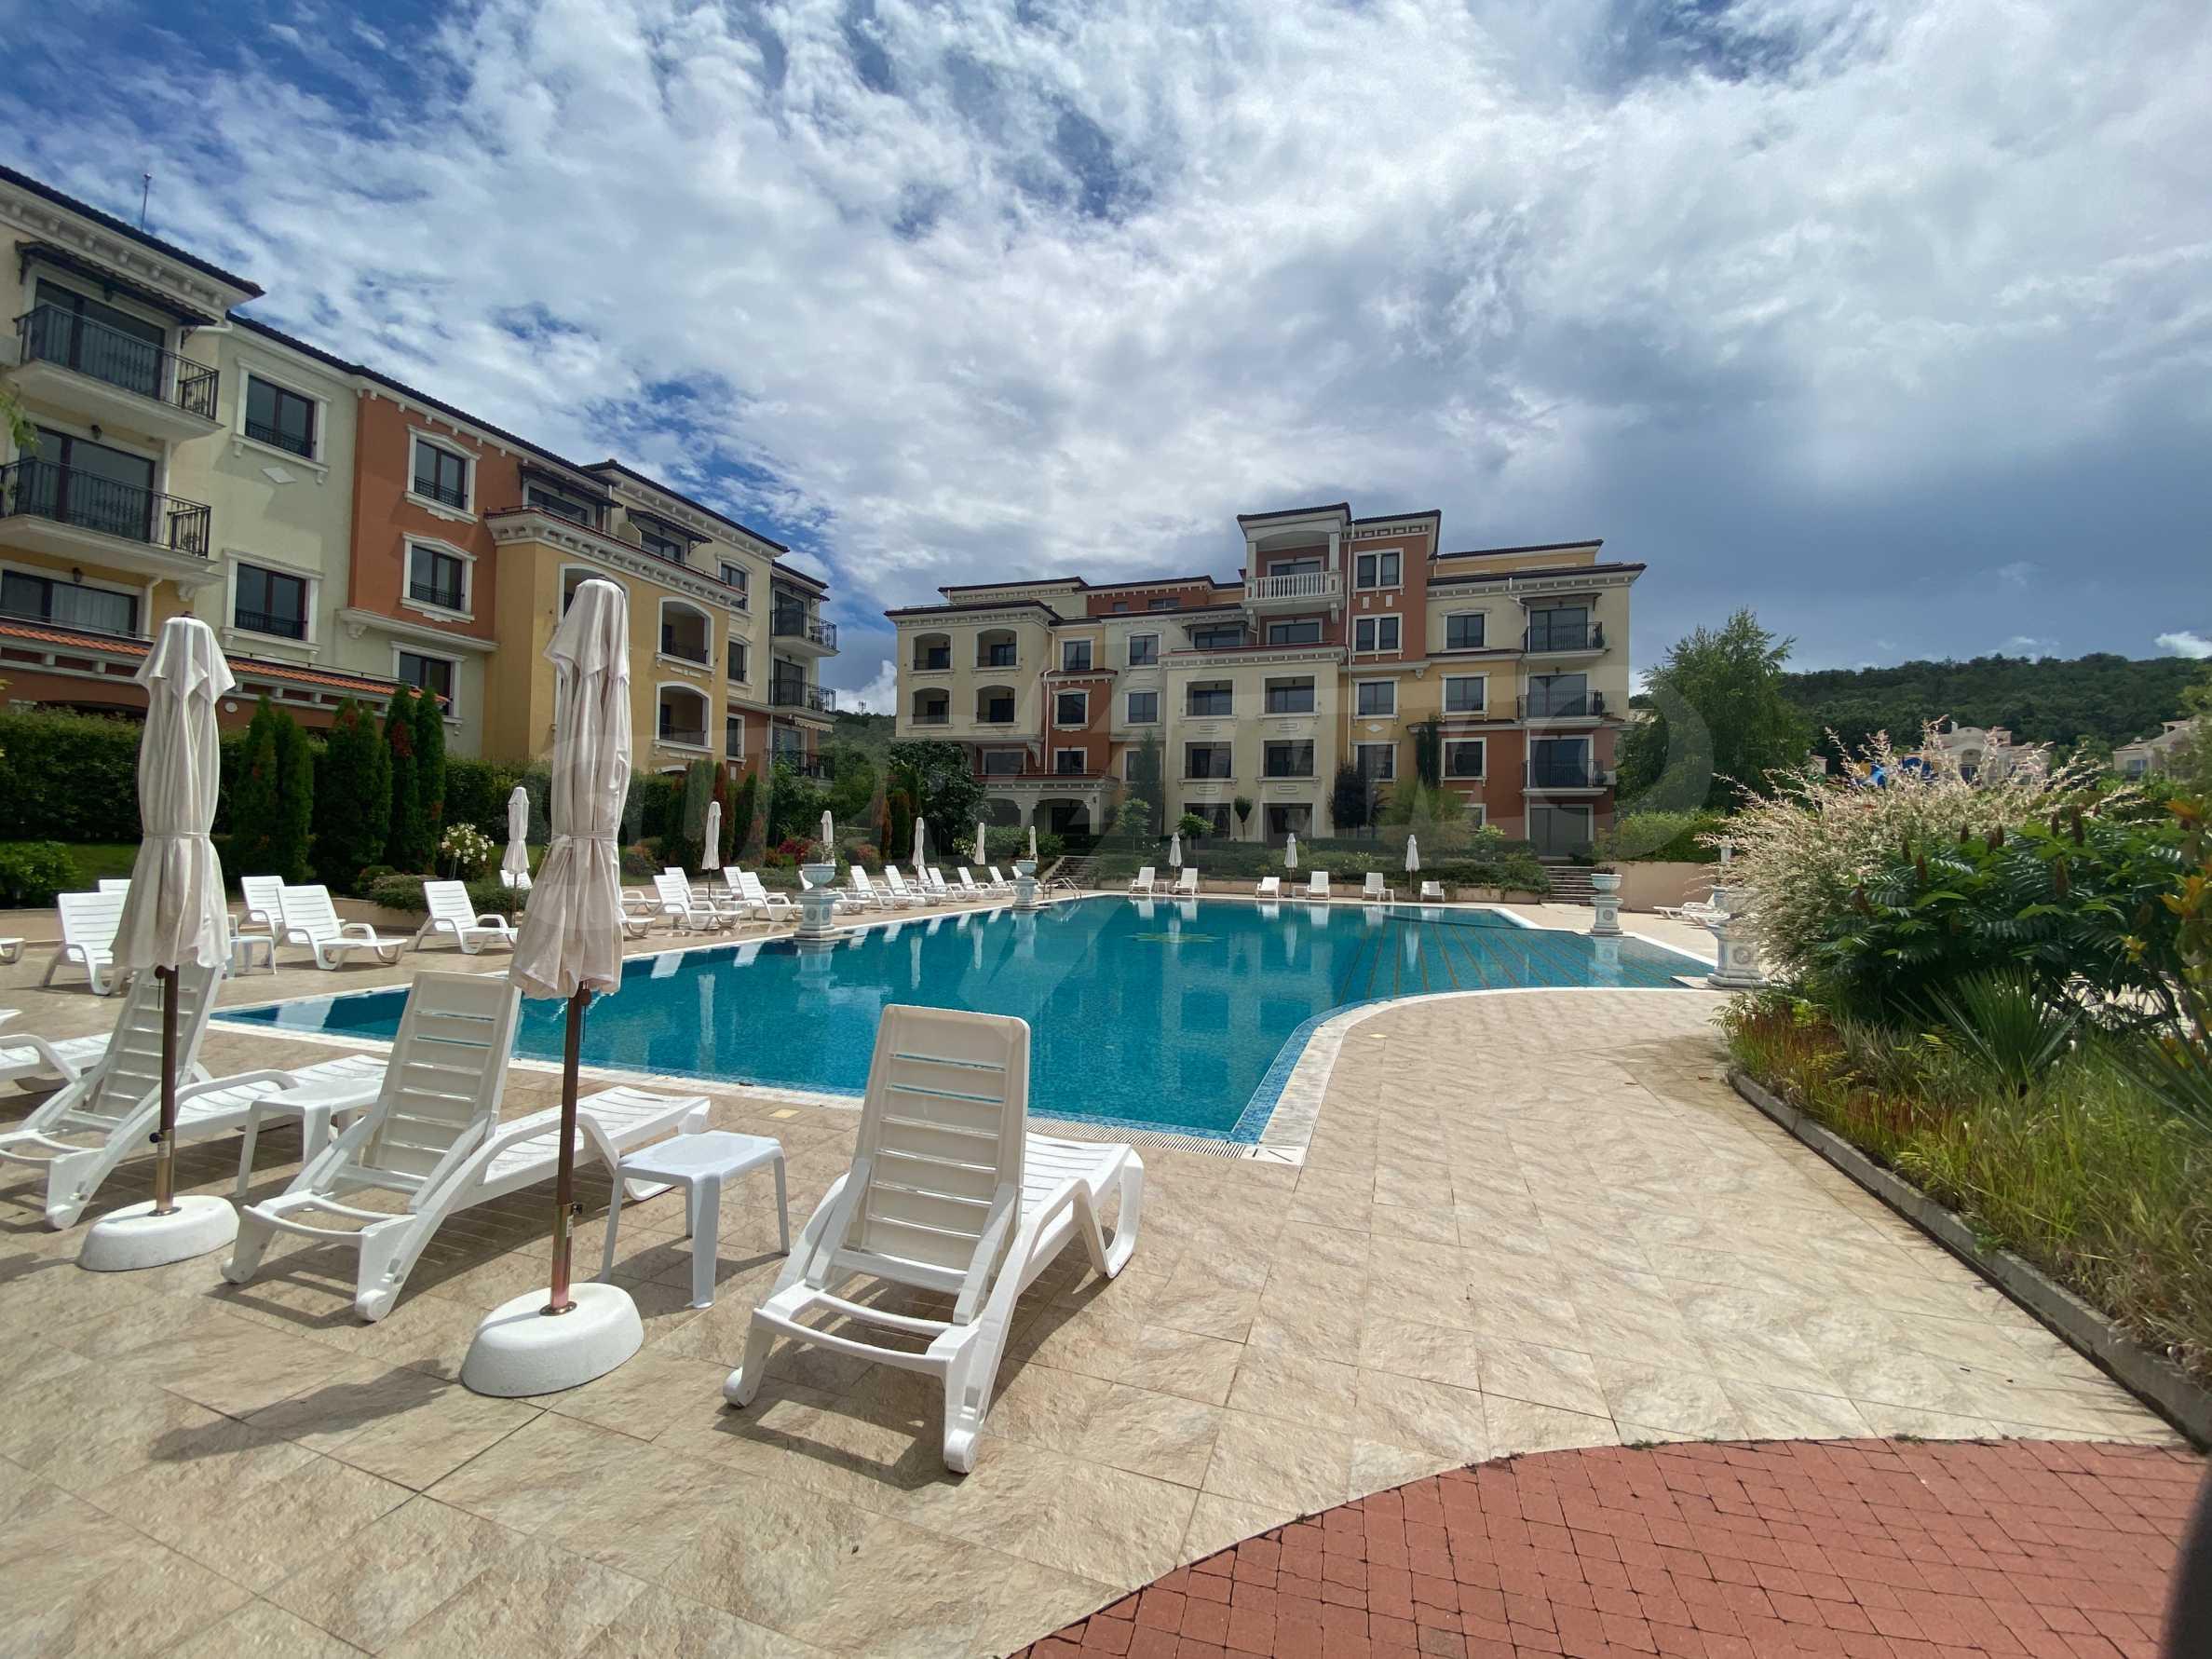 Lily Beach - splendid, built in Italian style complex near Kavatsi beach (Sozopol)